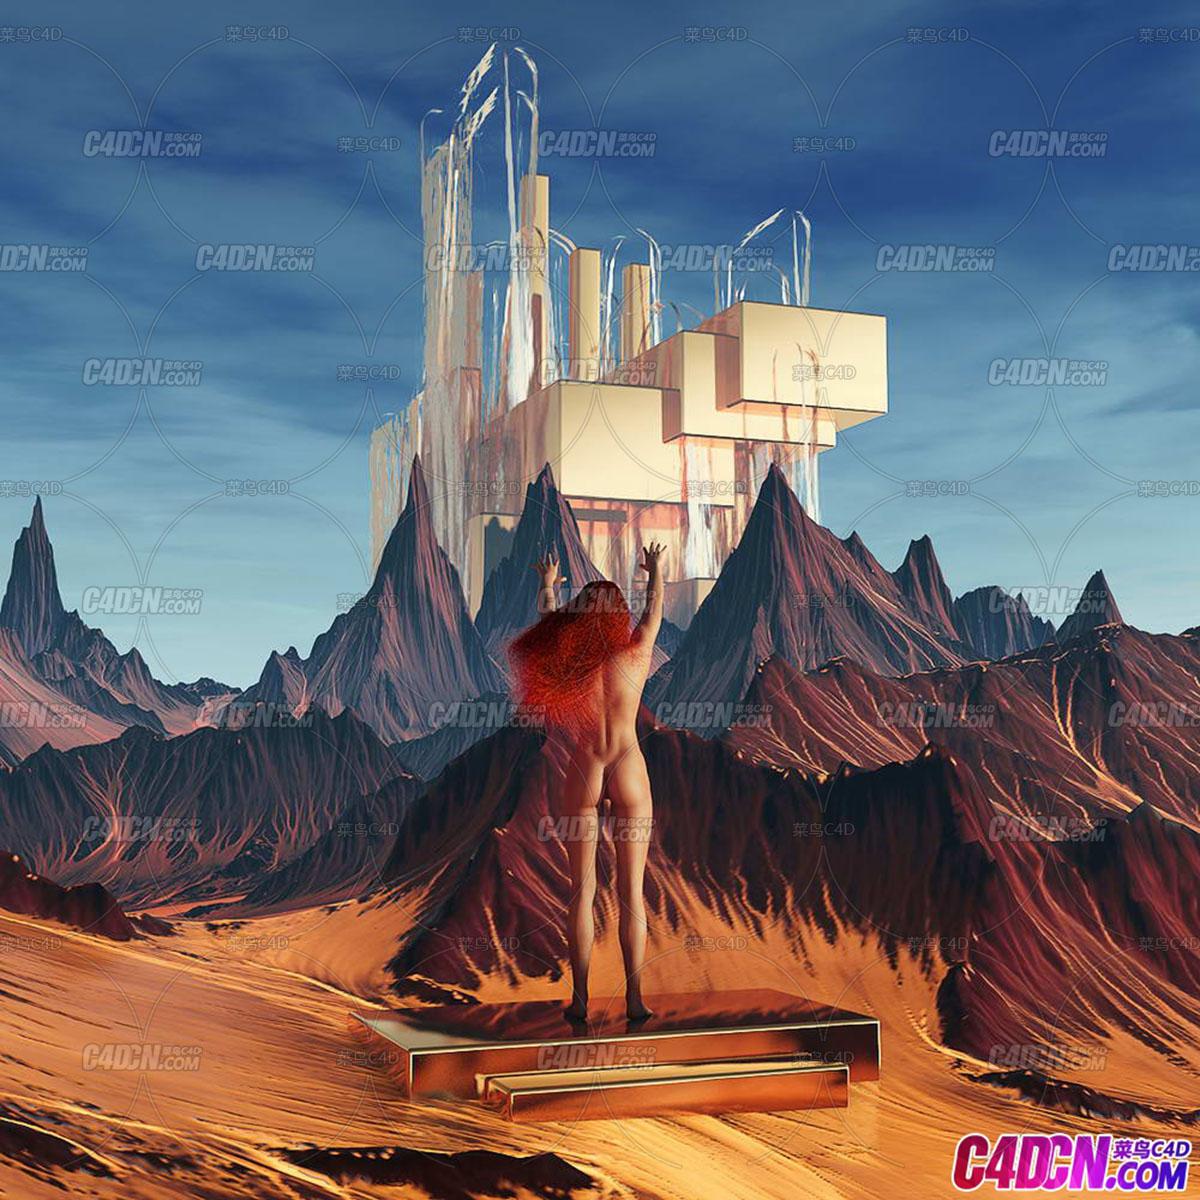 C4D精品工程 No.265 注视远方山峰建筑的女人体背影  Melisandre